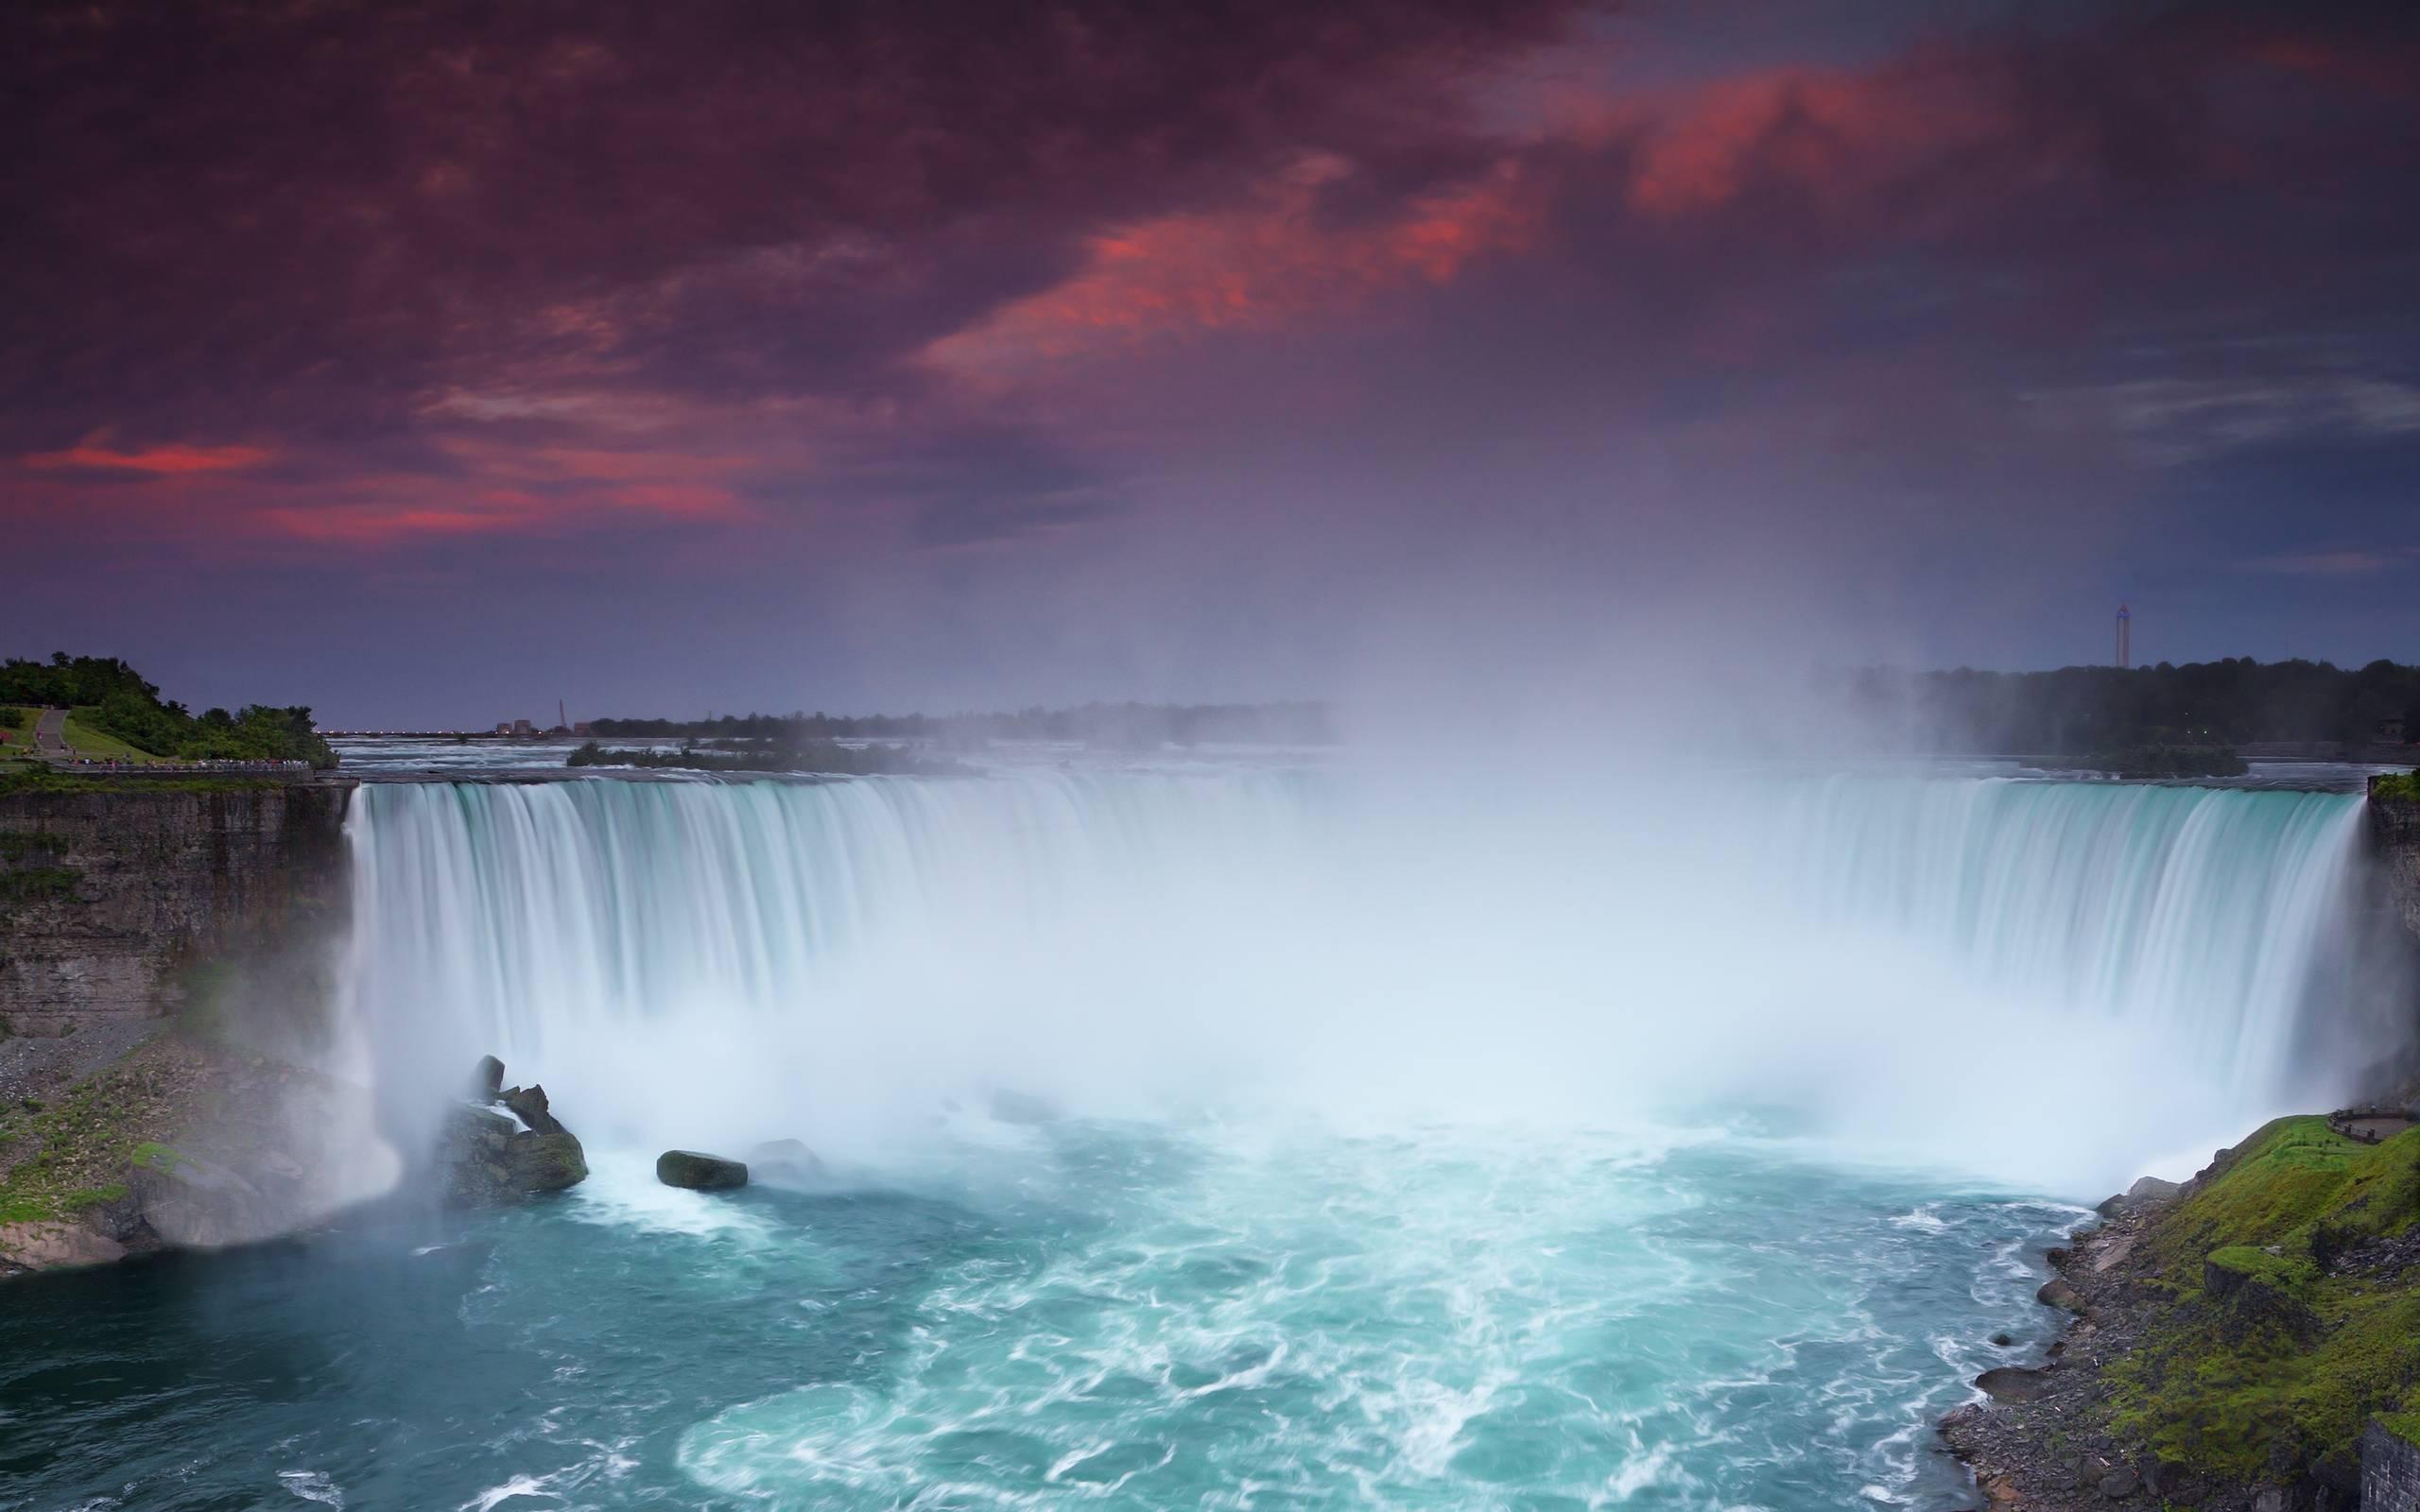 Niagara Falls Hd 1080p Wallpapers Niagara Falls Backgrounds Wallpaper Cave